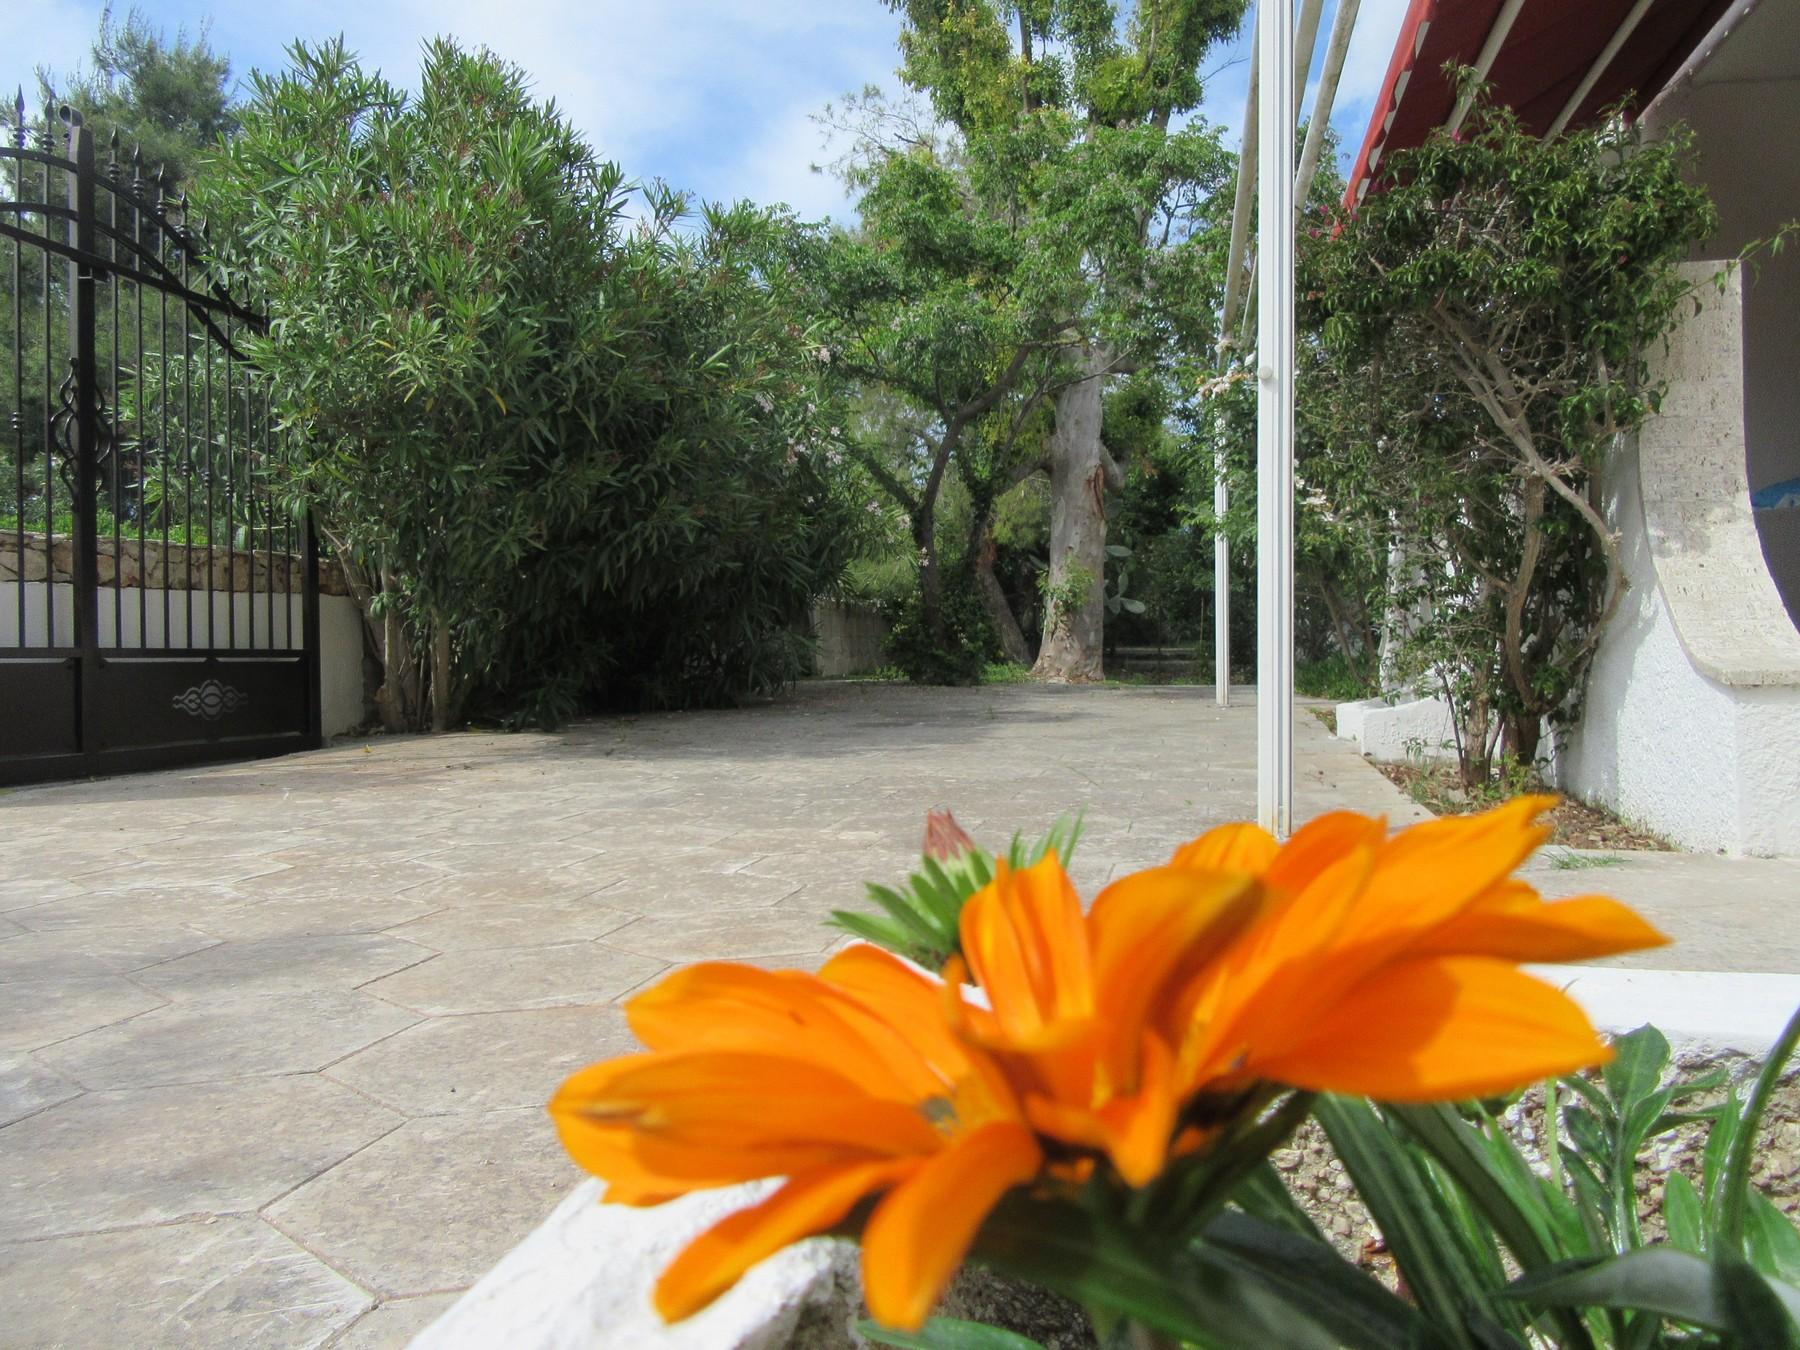 Ferienhaus Villa Mariposa n°3, only 200 meters from the beach (2354067), Porto Cesareo, Lecce, Apulien, Italien, Bild 19